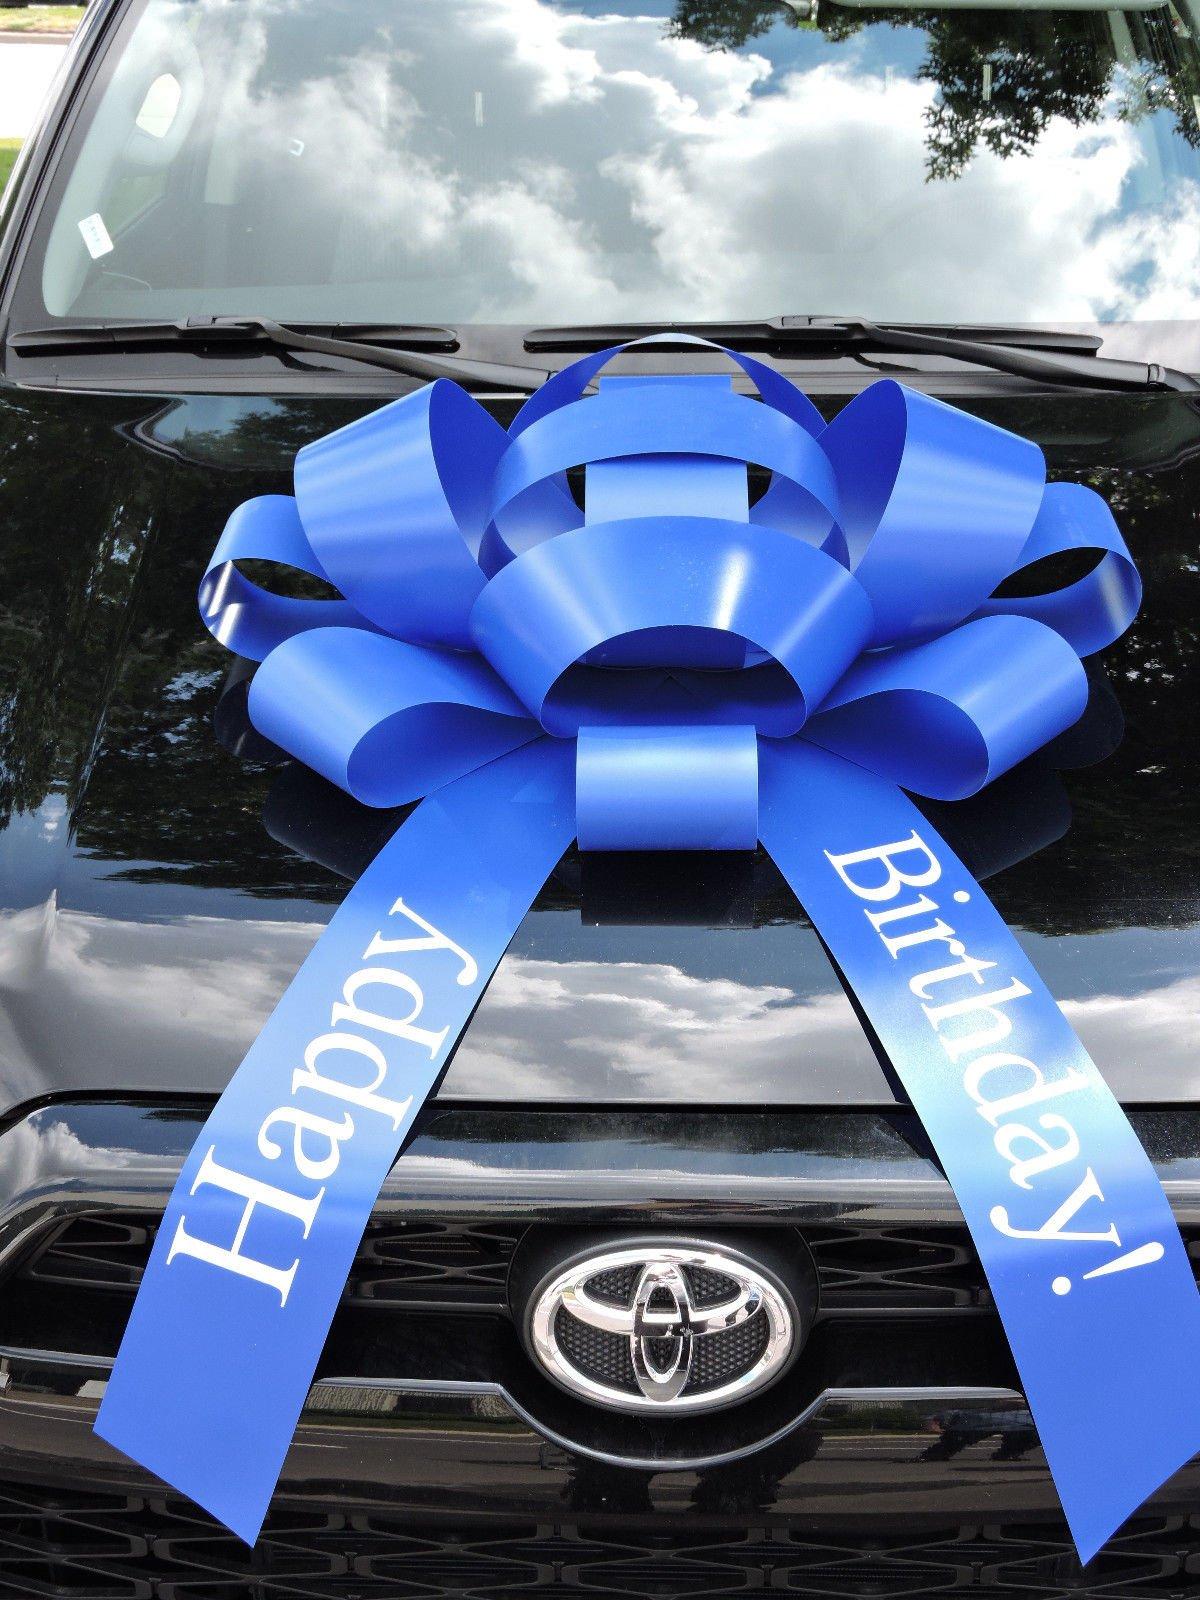 Eight24hours Blue Happy Birthday Car Bow Vinyl Magnetic Back No Scratch 2.5 feet - Blue